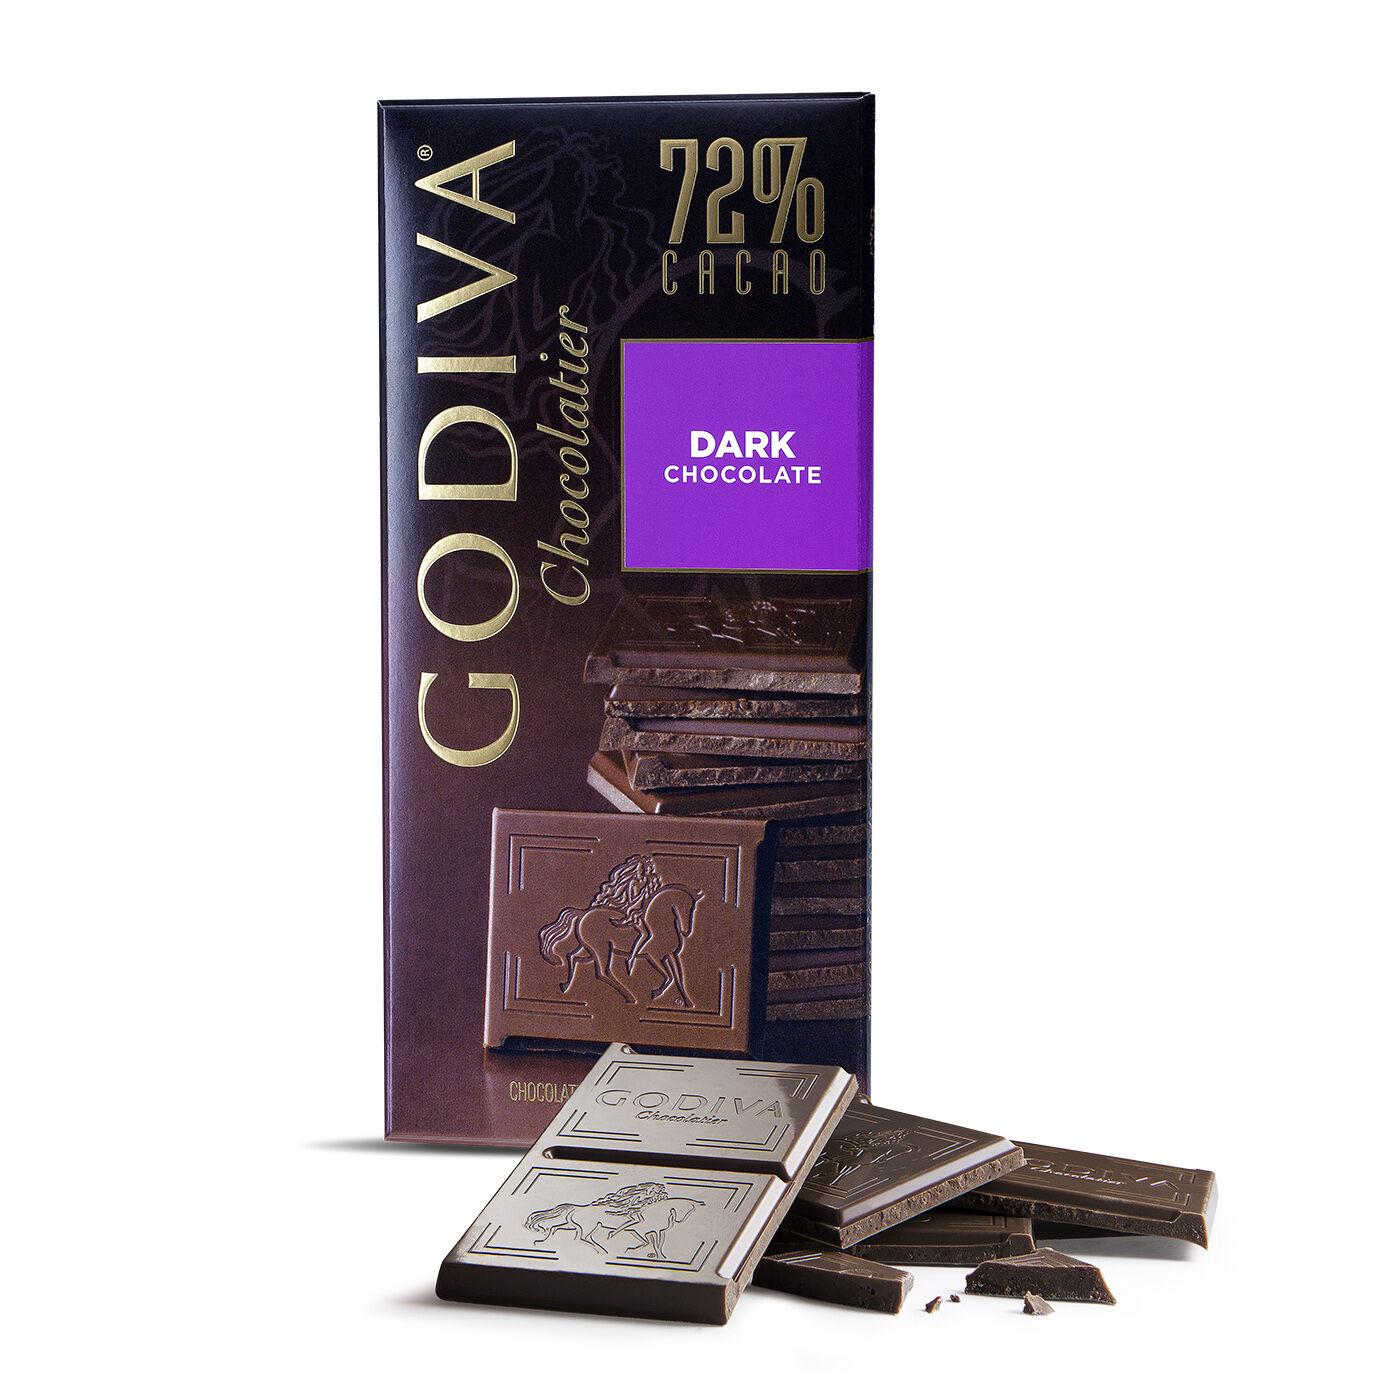 Large 72% Dark Chocolate Bar